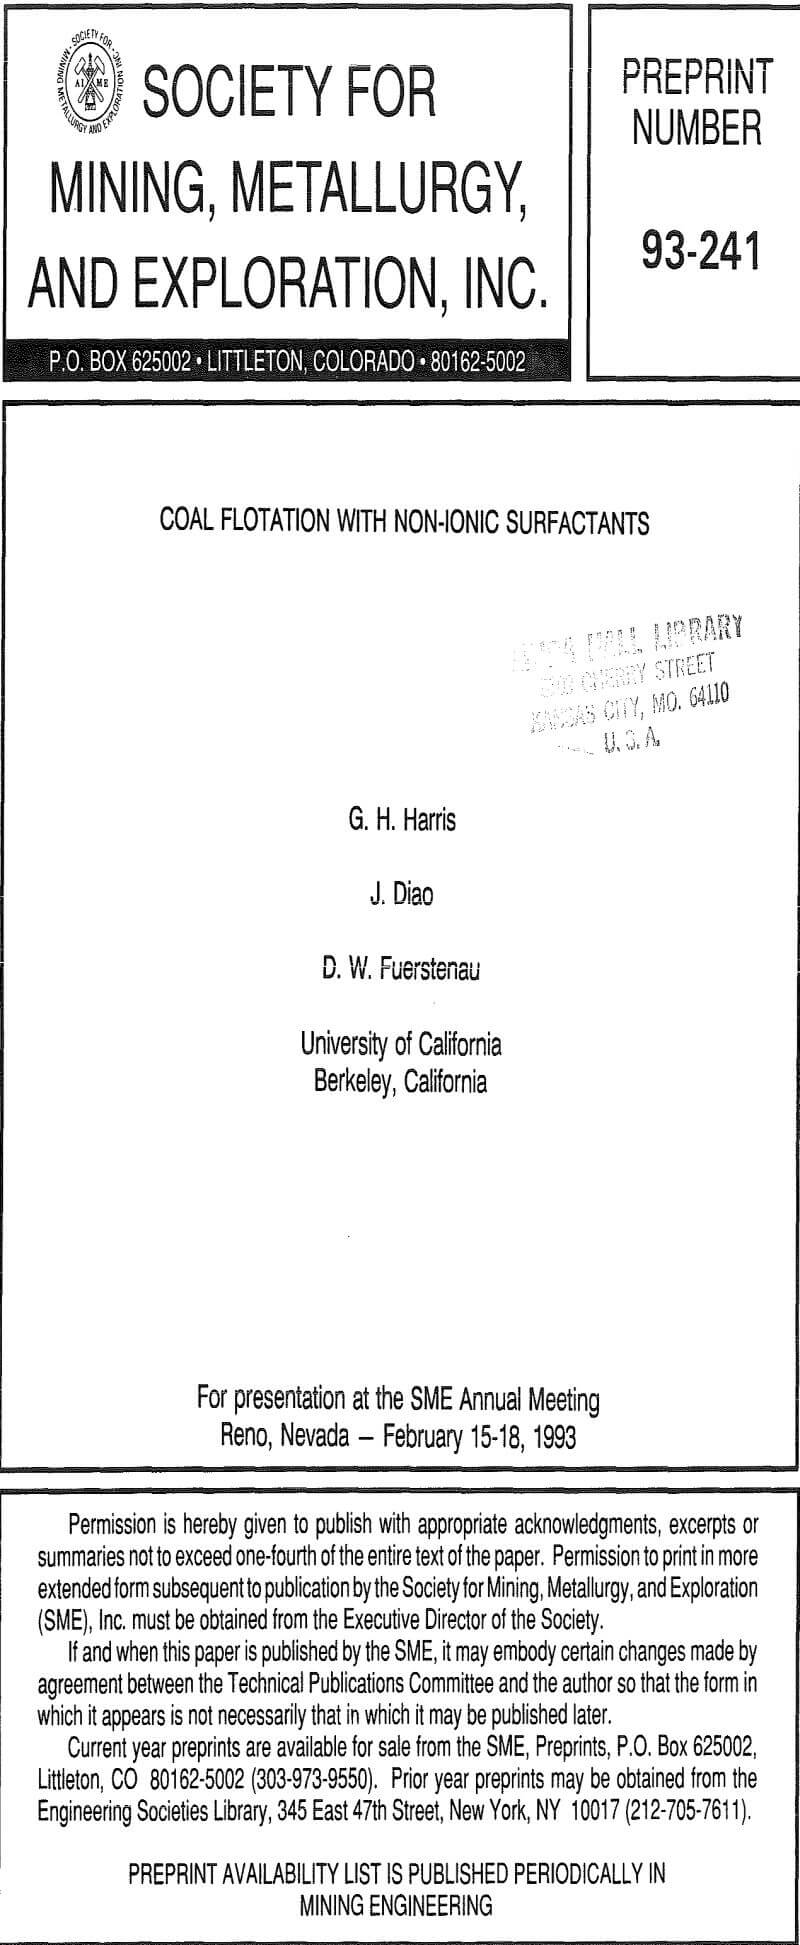 coal flotation with non-ionic surfactants